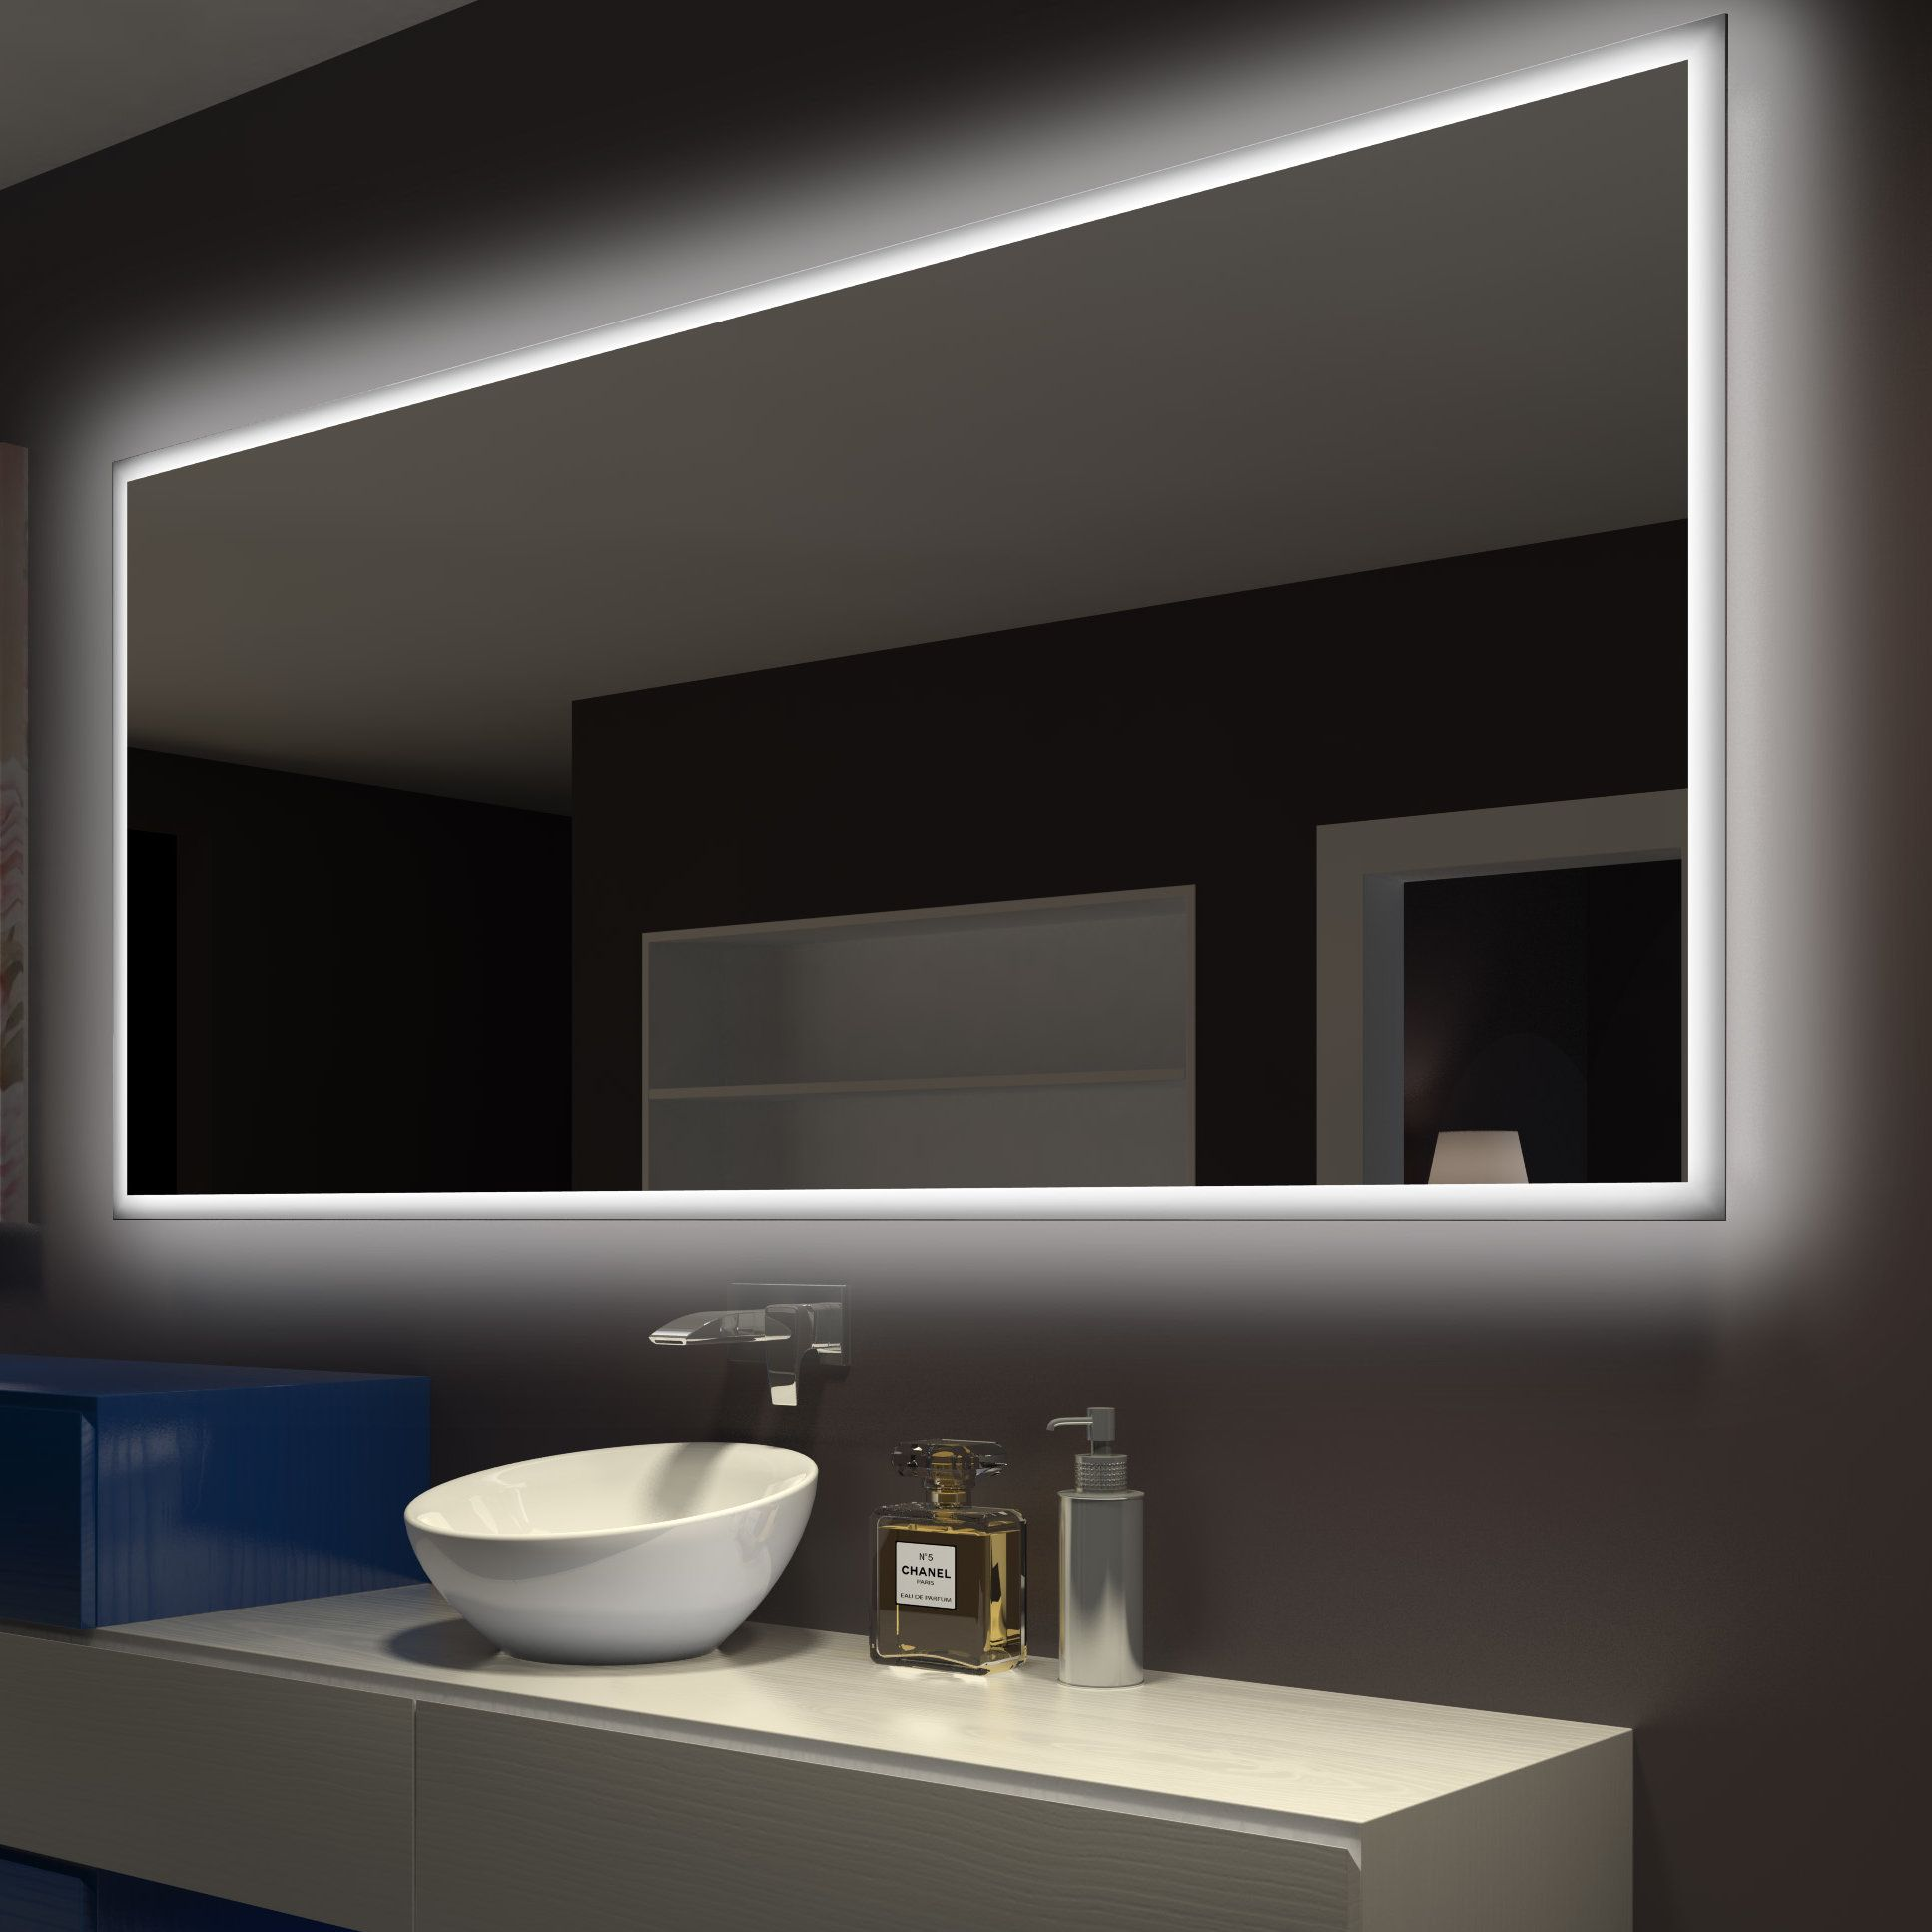 Rectangle Backlit BathroomVanity Wall Mirror  Products  Pinterest  Salle de Bain Salle de